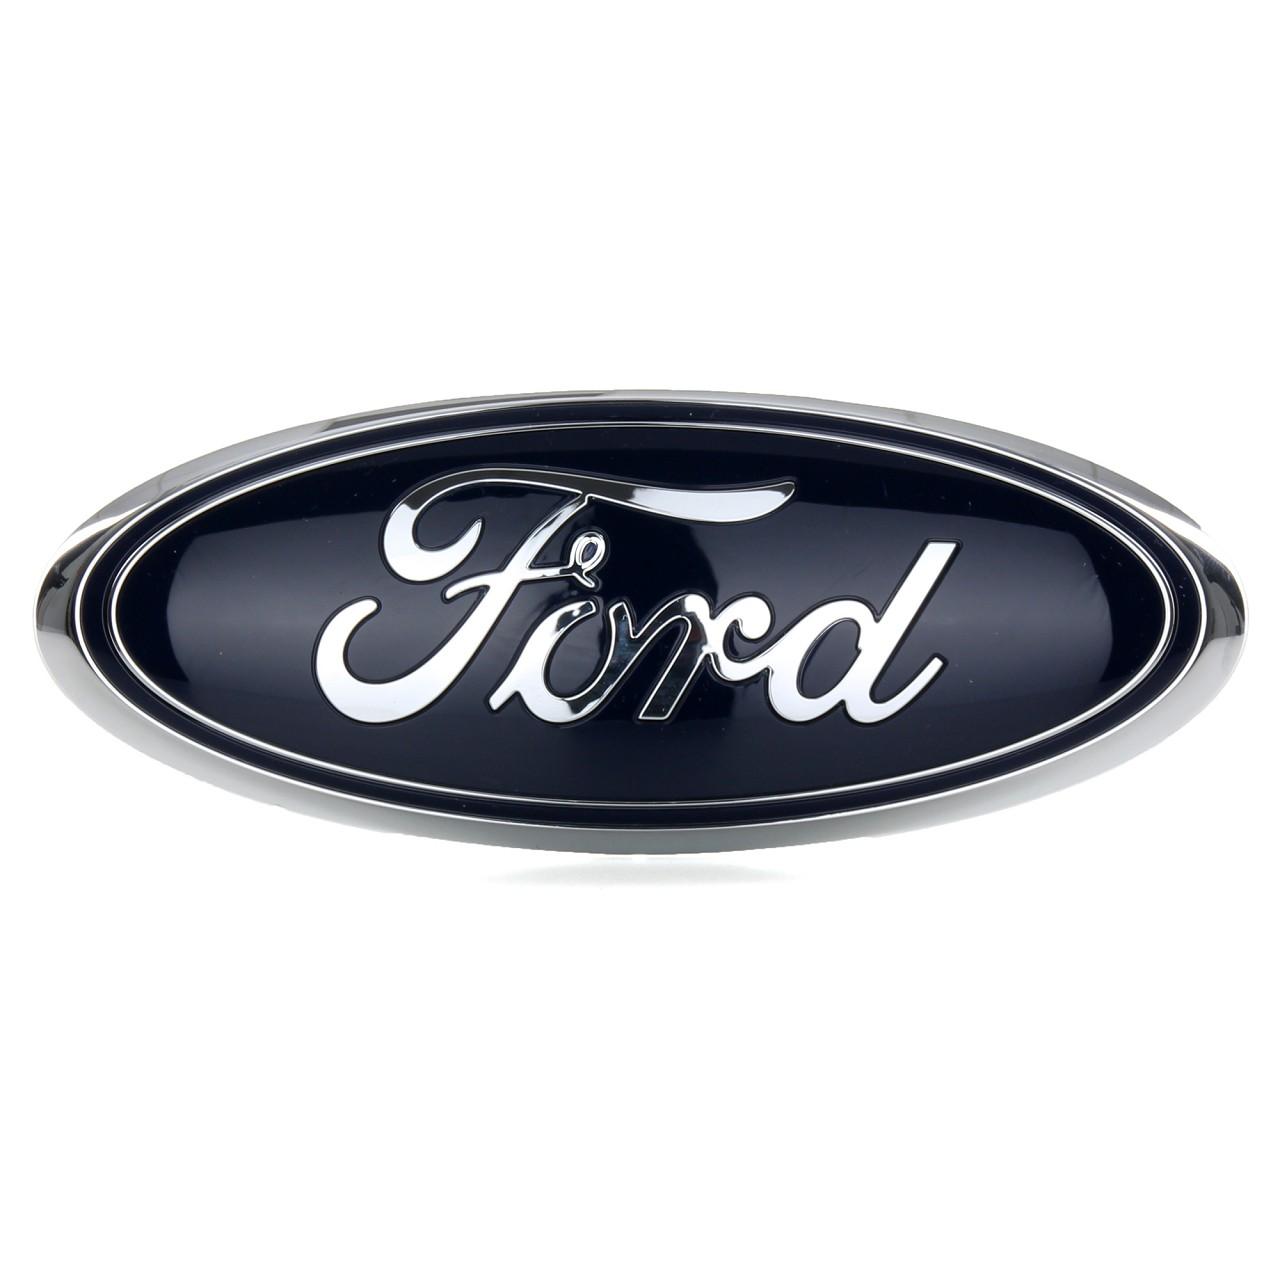 ORIGINAL Ford Emblem Schriftzug Zeichen Oval Kühlergrill RANGER (TKE) 5254490